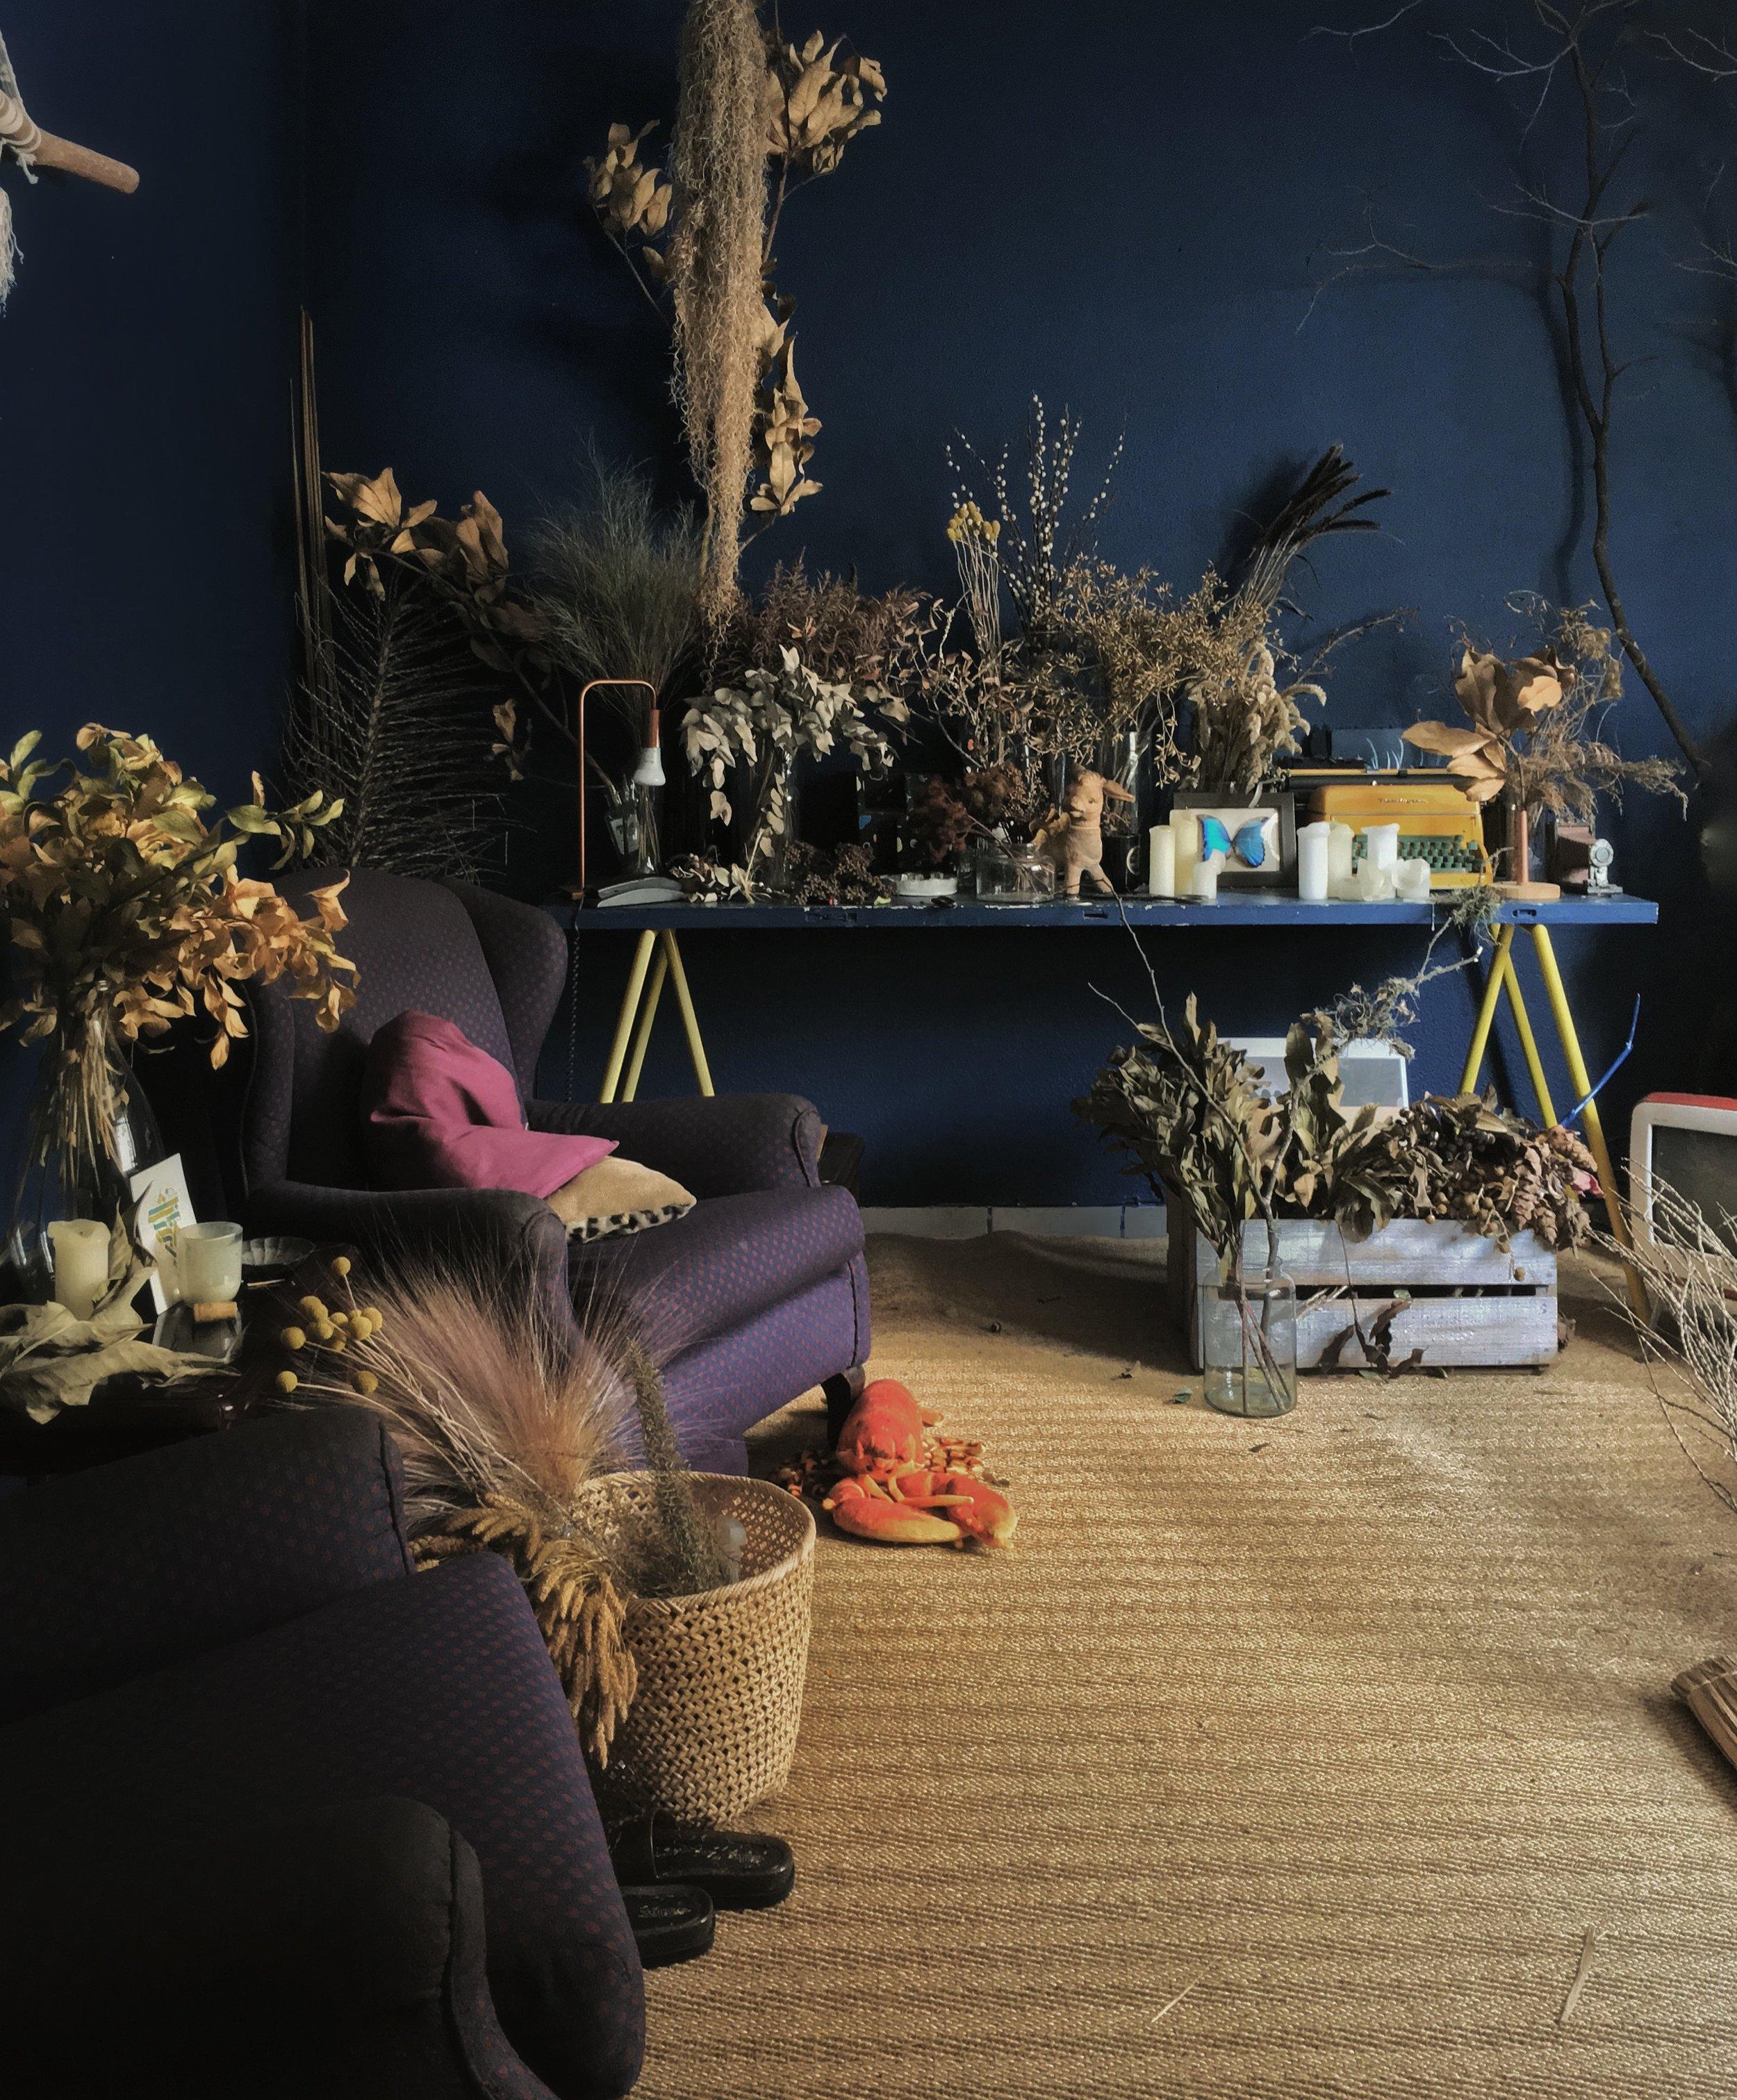 09-old-livign-room.jpg